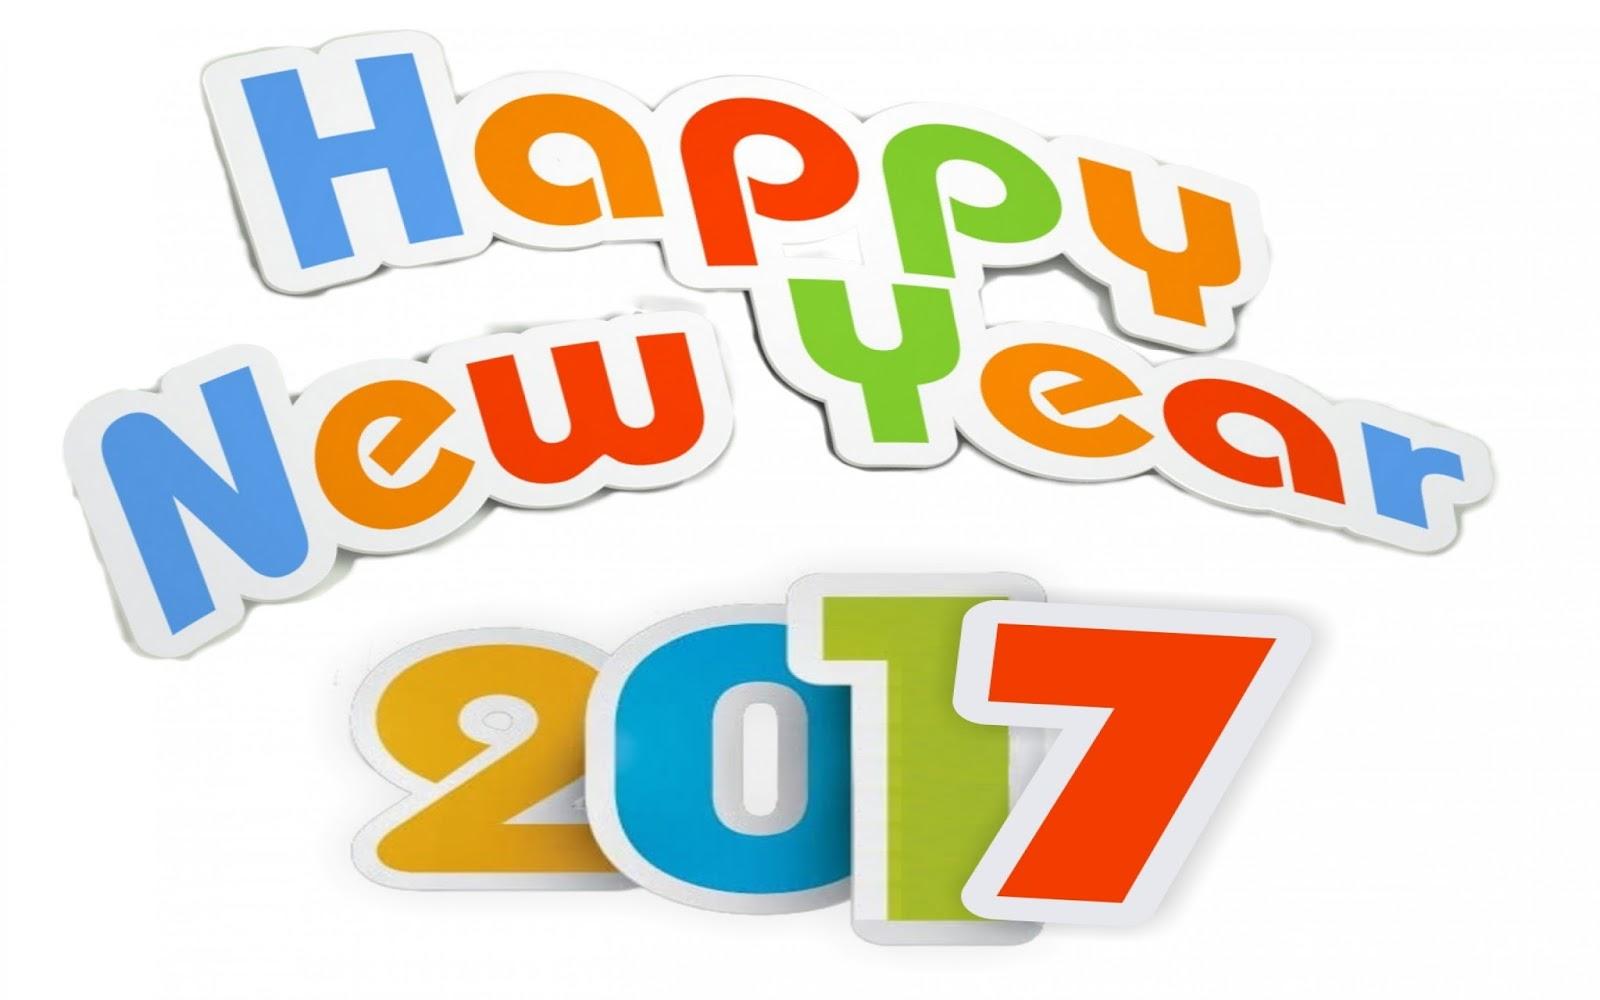 Happy new year 2017 pics